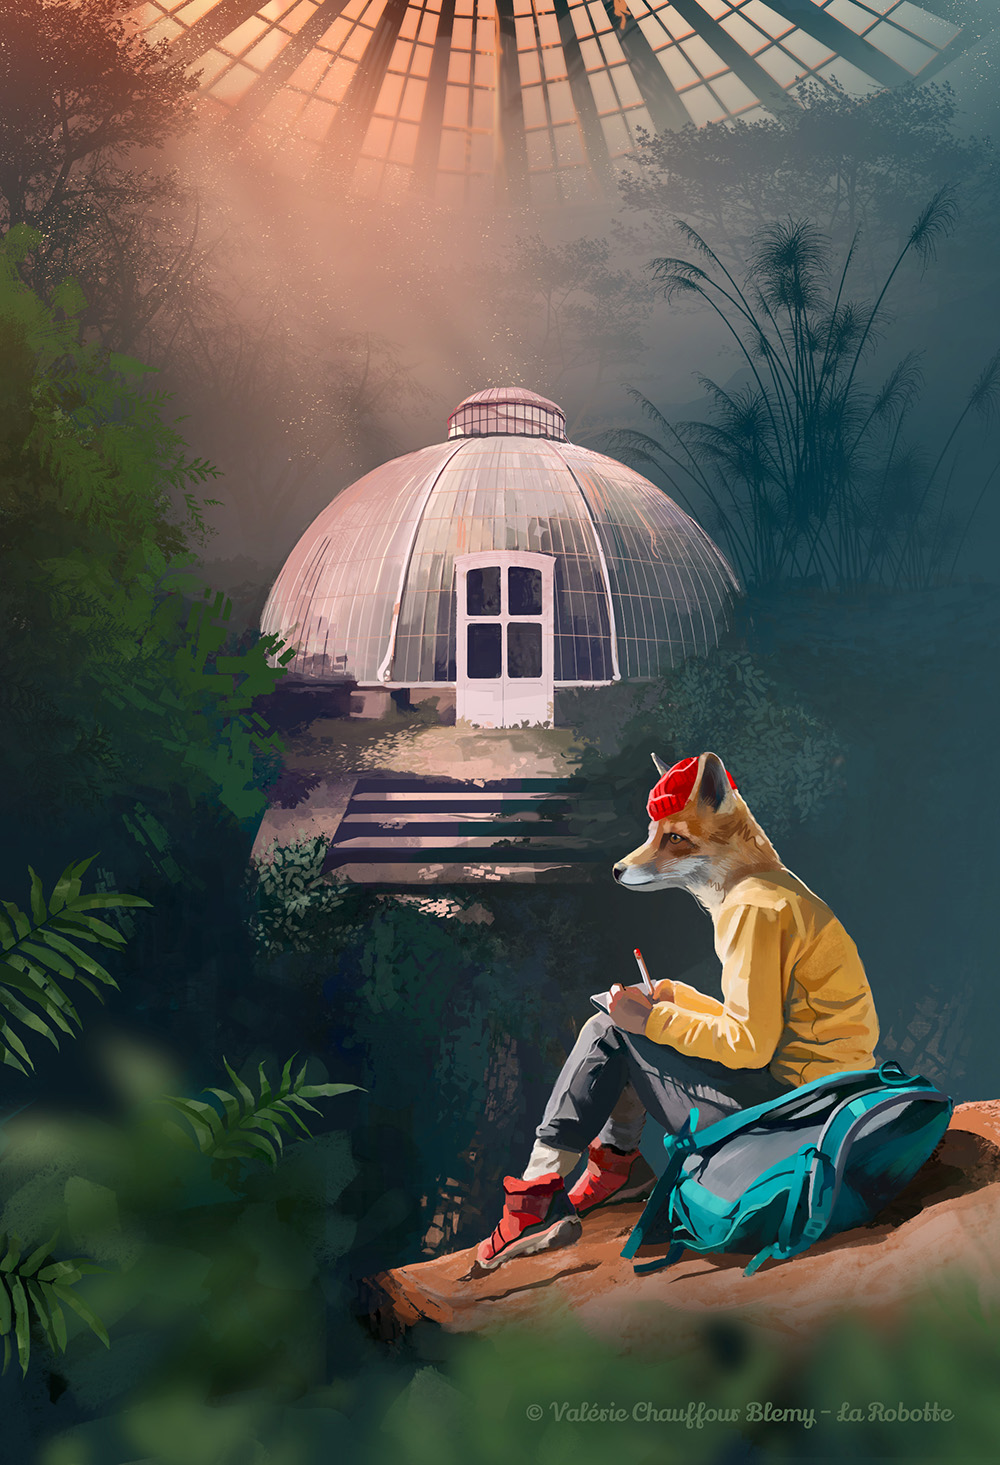 Journey - Concept Art - Digital art by Valérie chauffour Blemy @LaRobotte